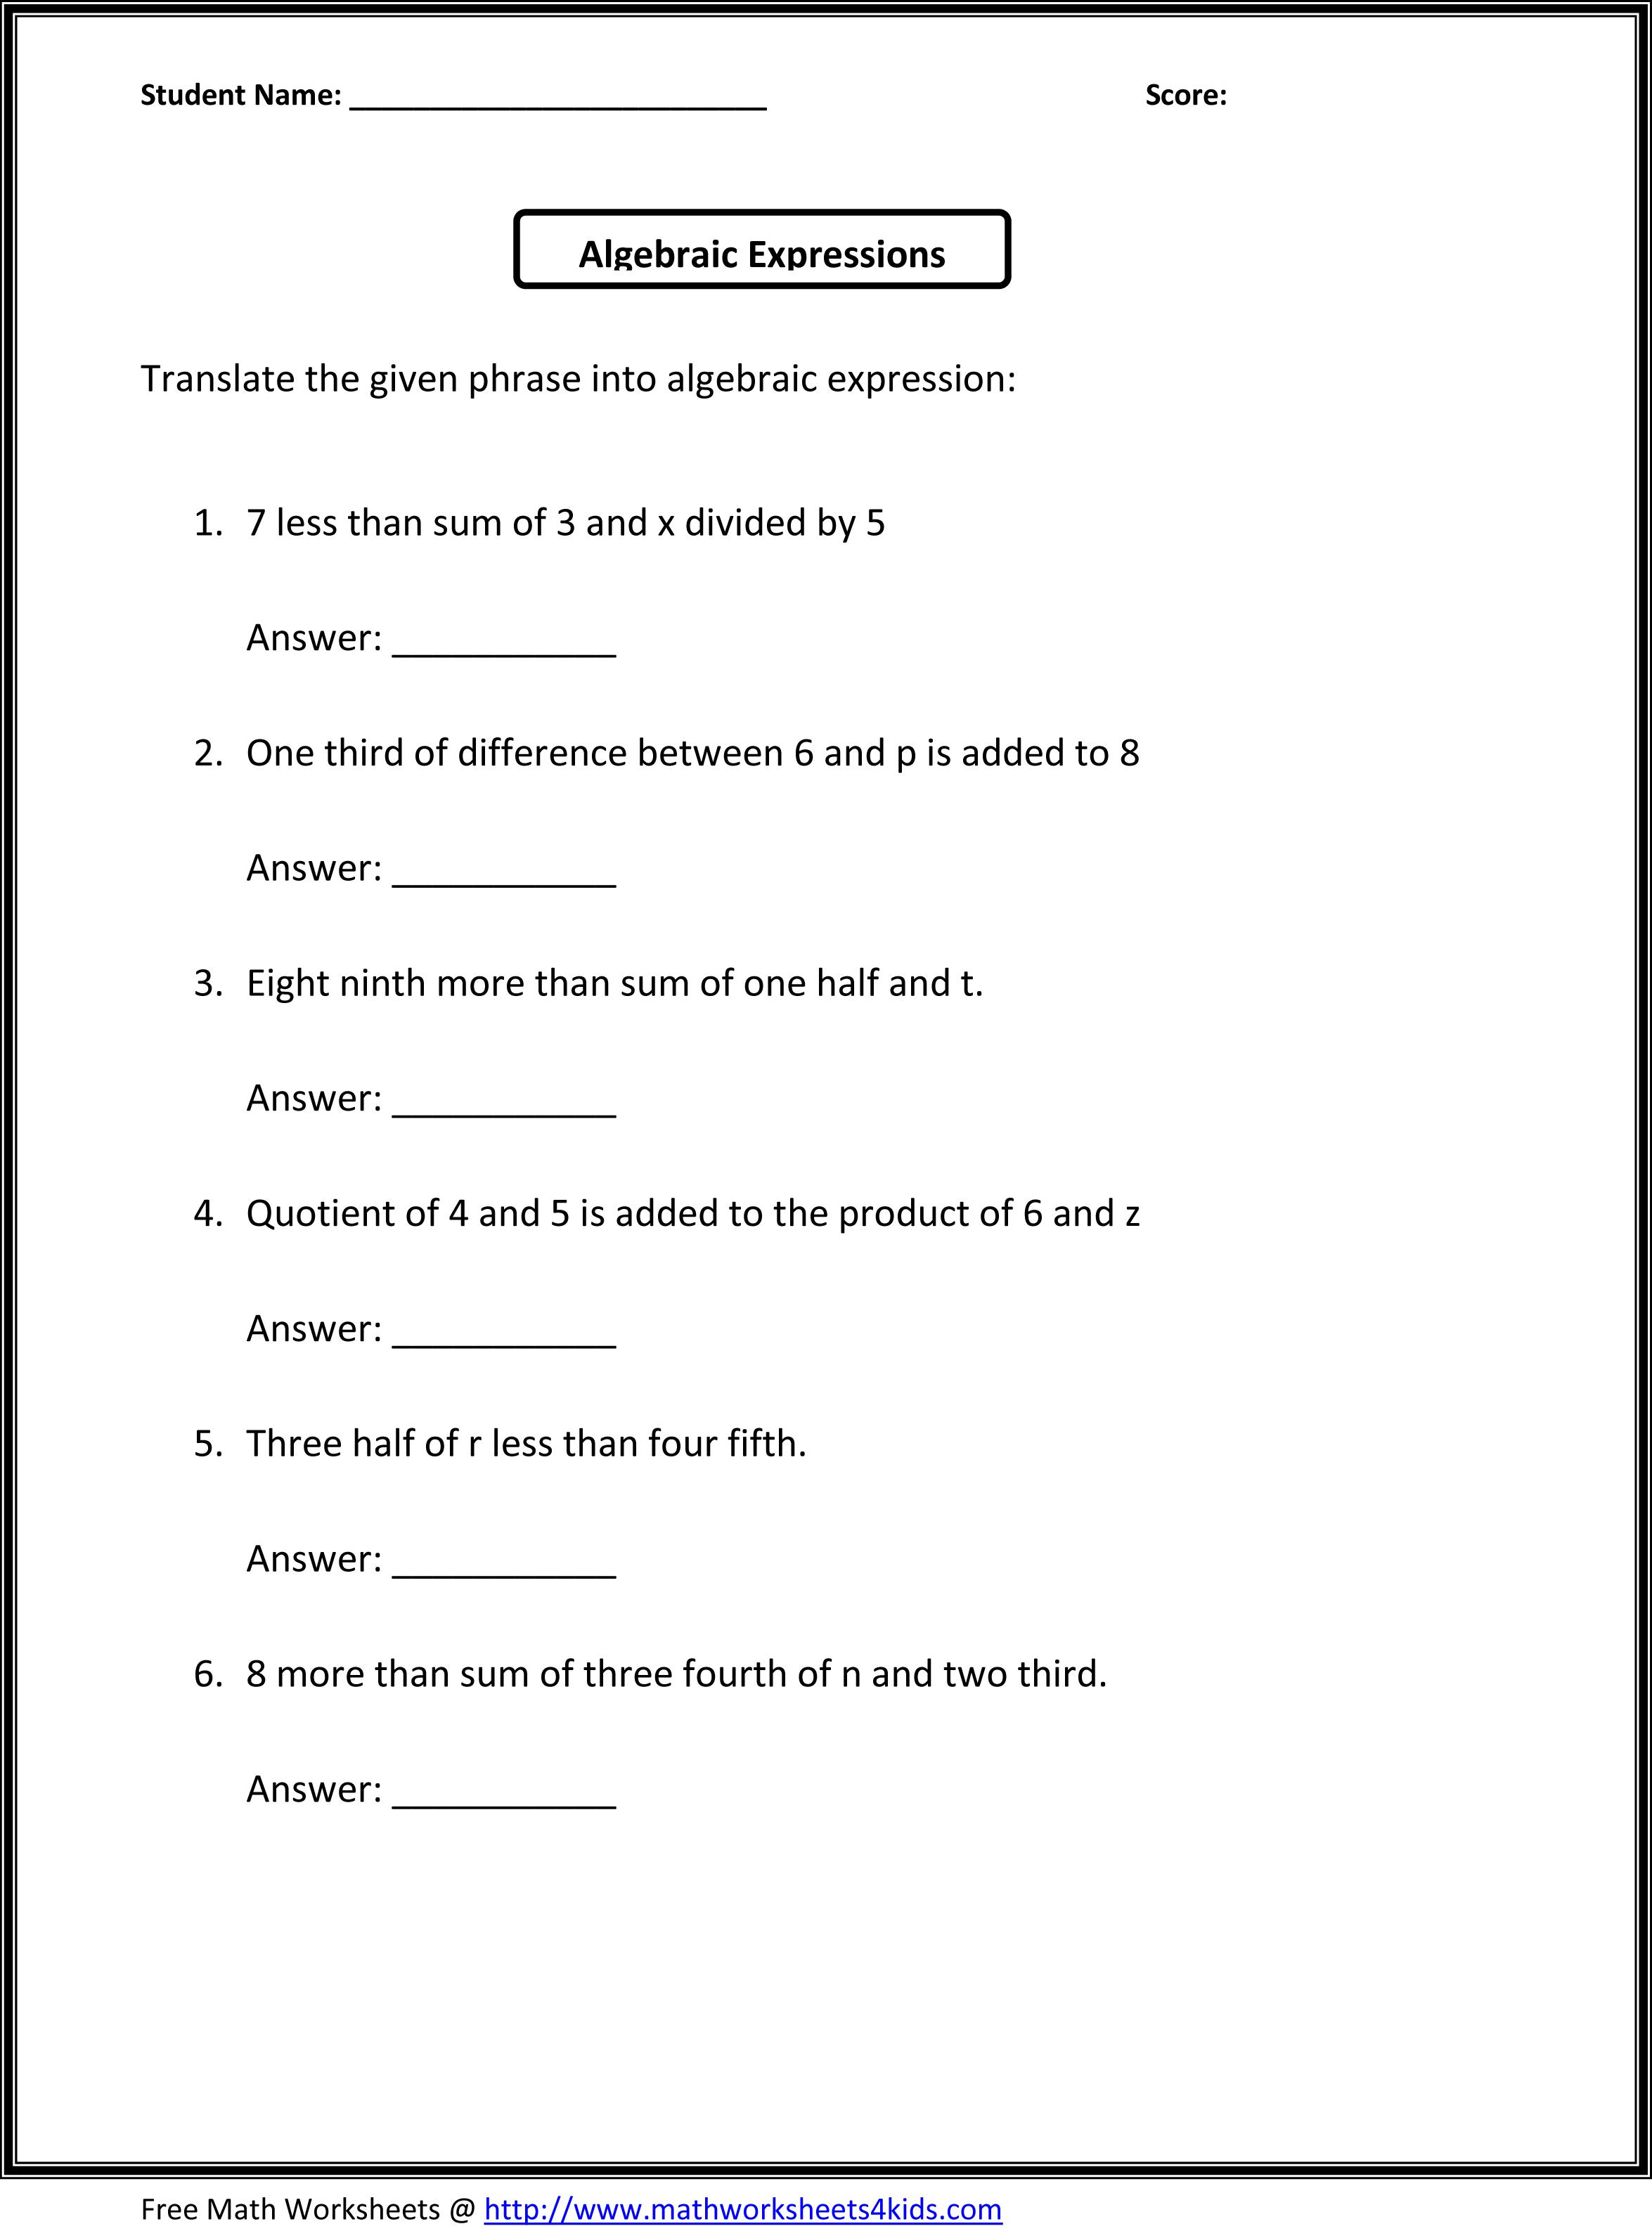 Division Worksheet For 6th Grade